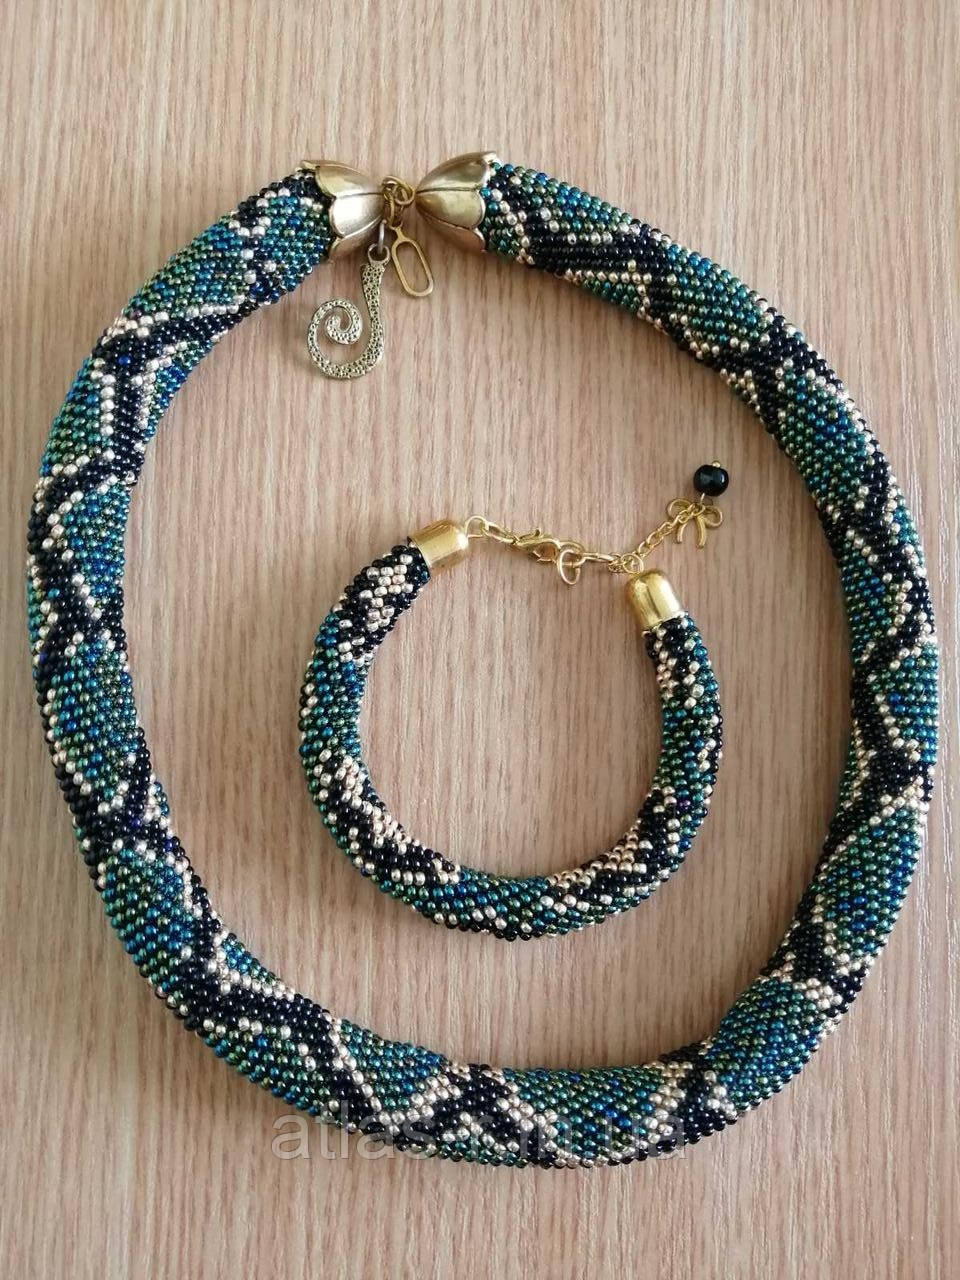 Комплект - браслет та намисто. Джгут змія ручної роботи